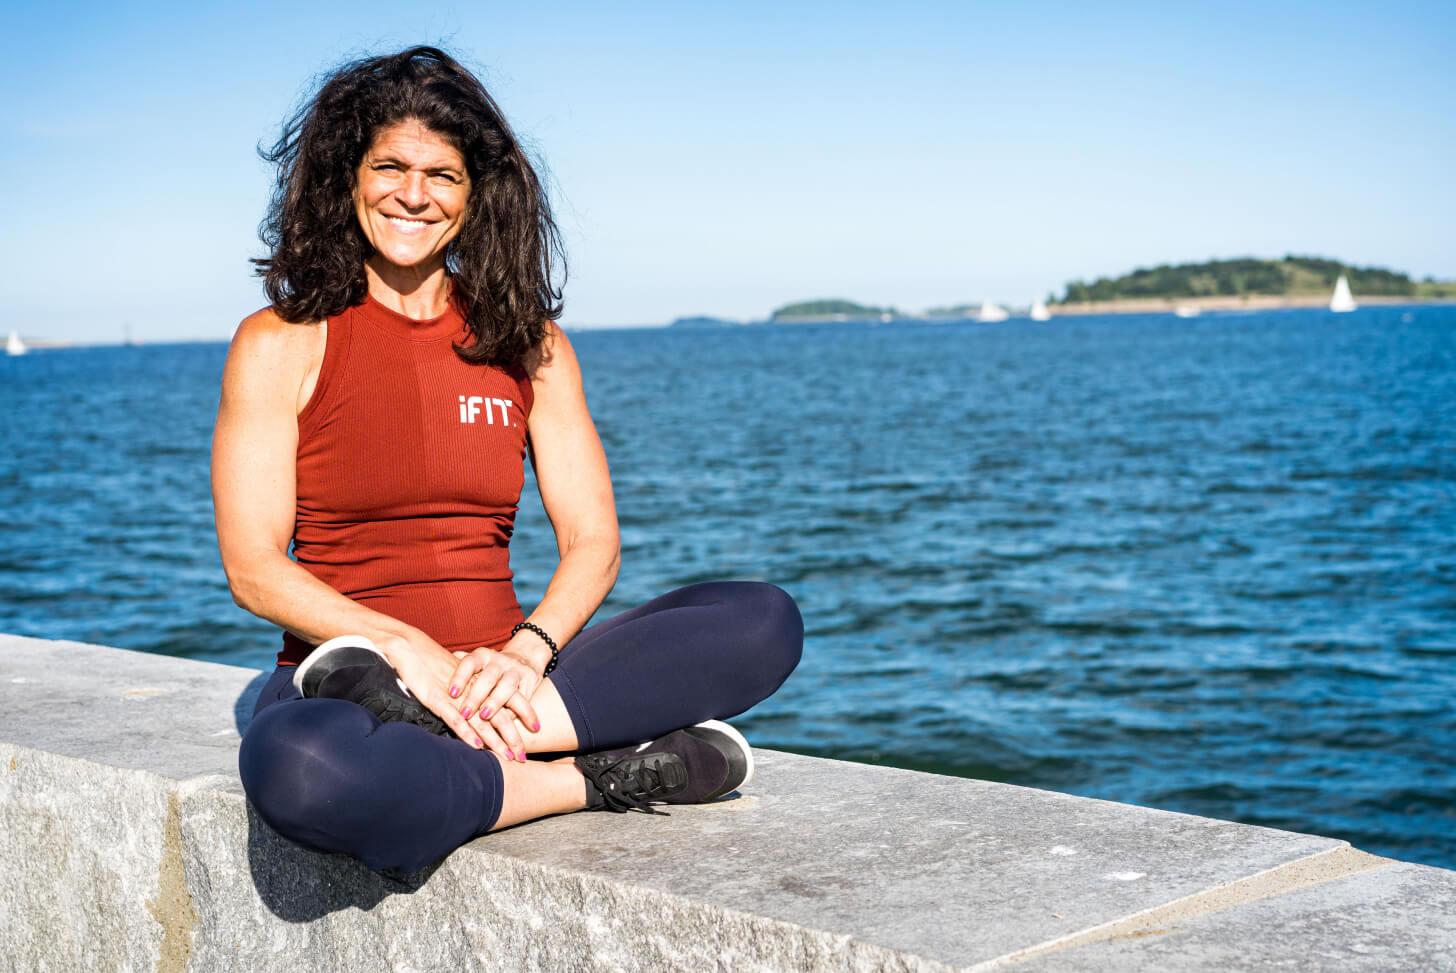 iFIT Guide Dr. Eva Selhub coaches a walking class